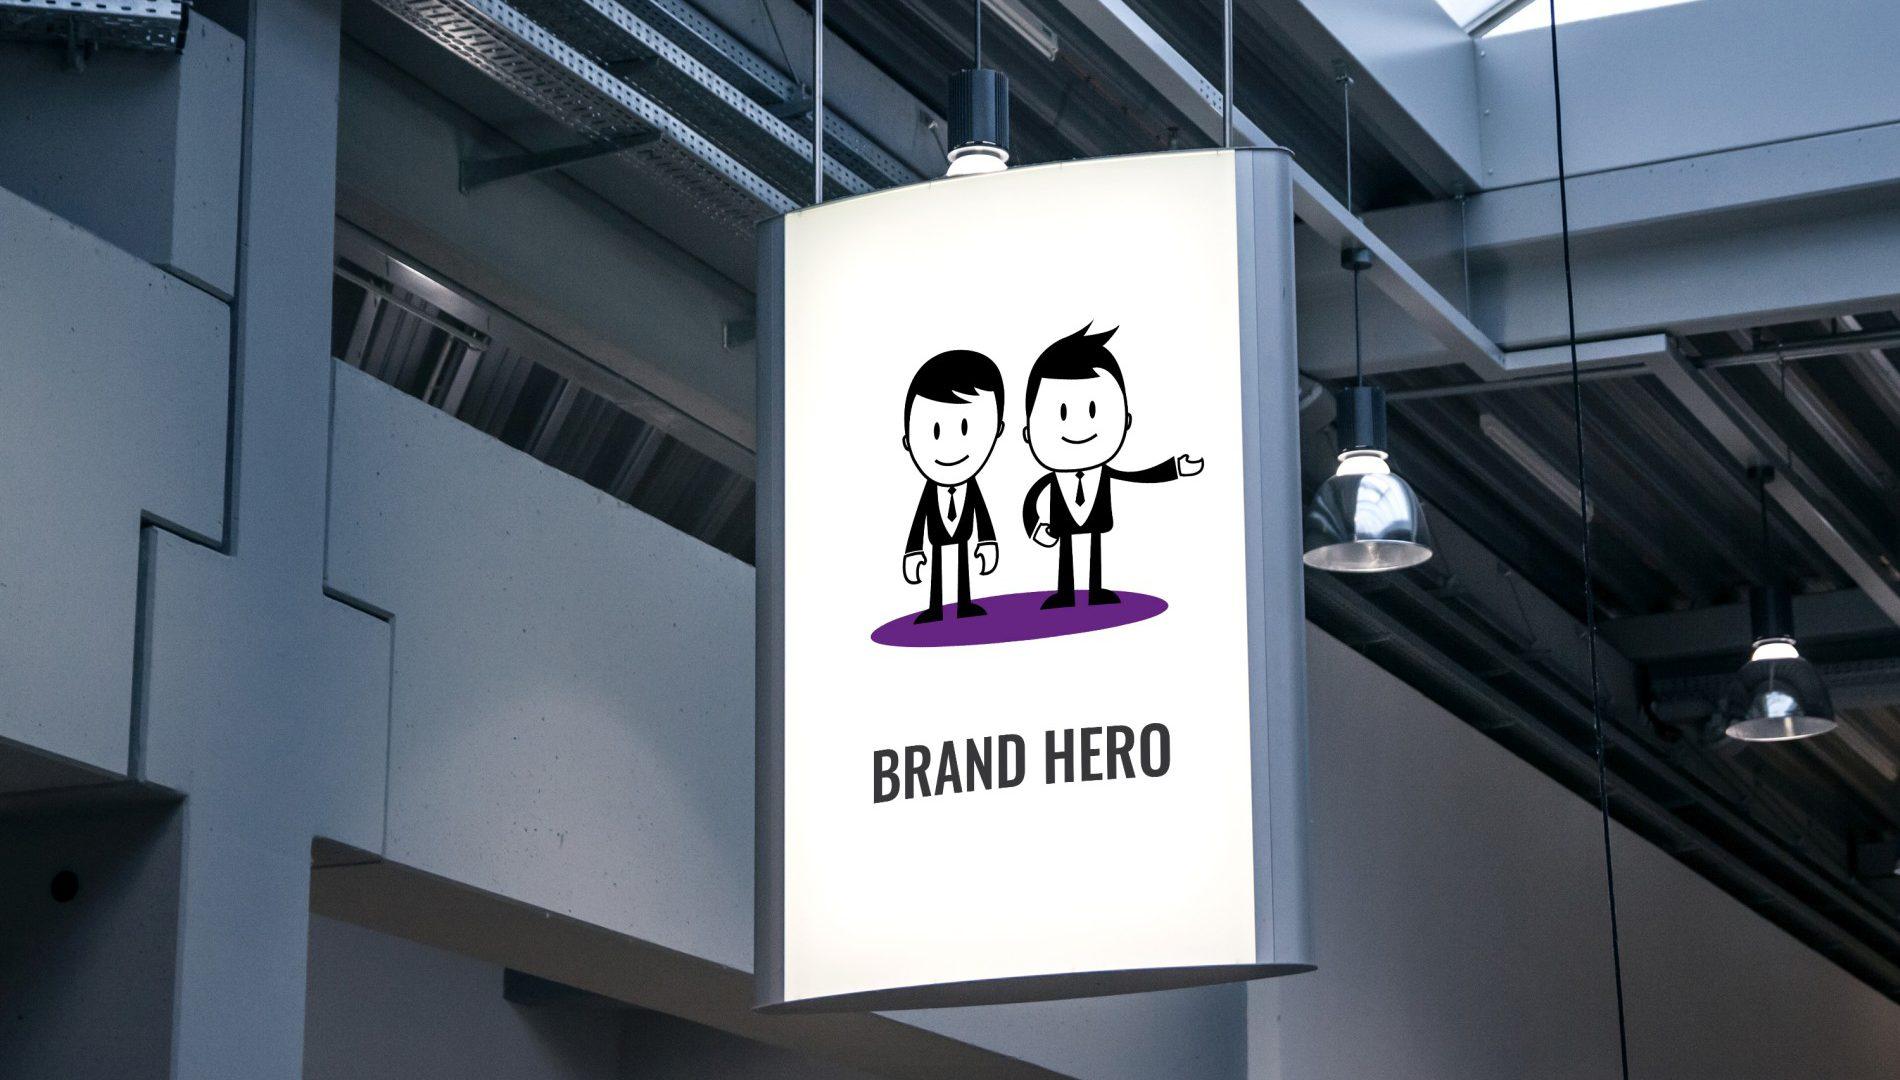 chlopaki z agencji reklamowej brand hero